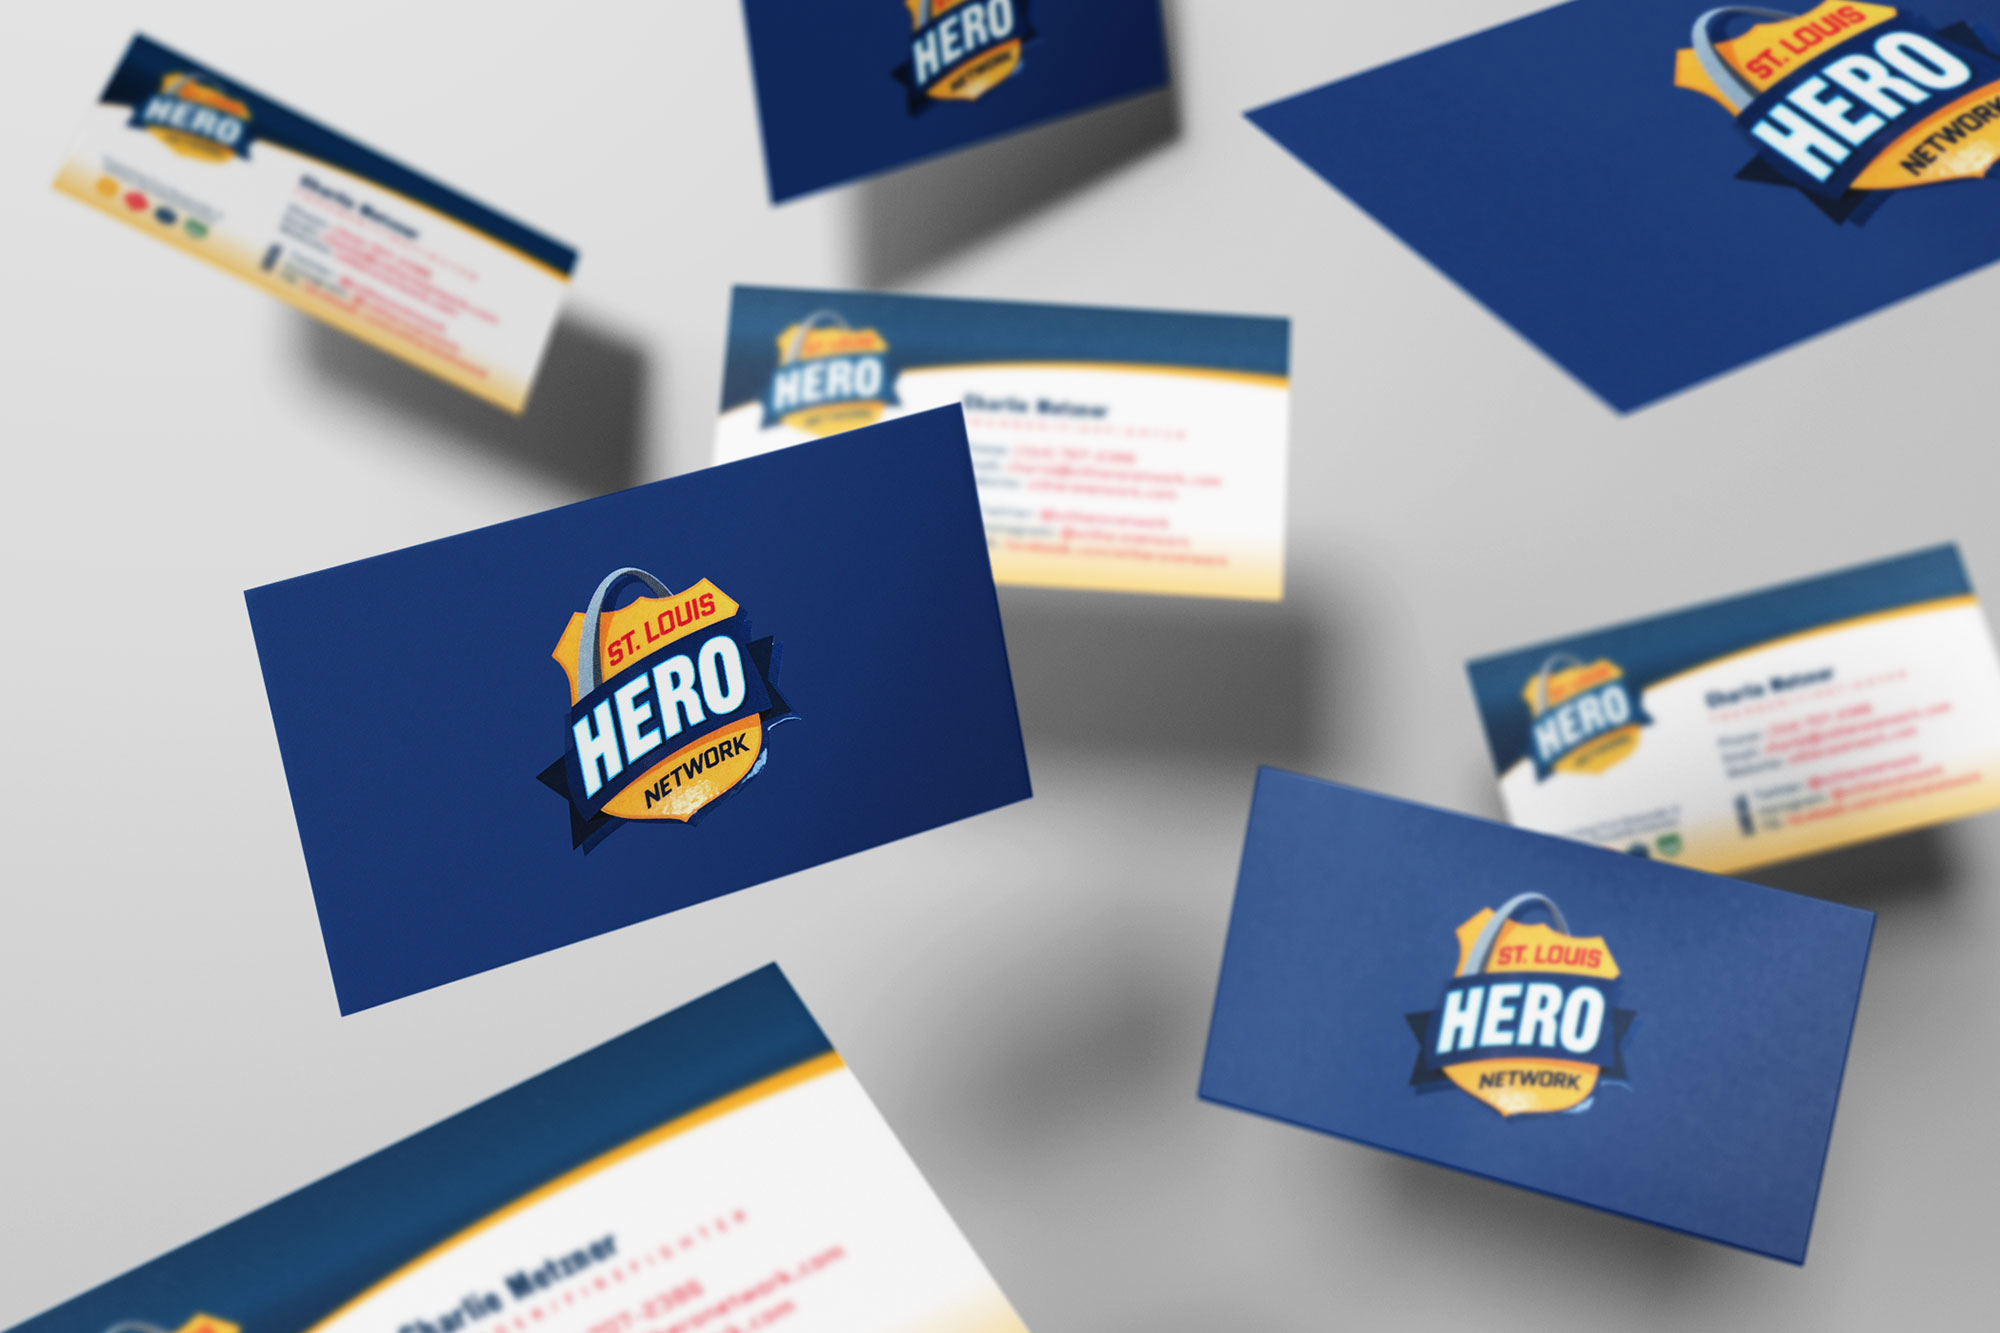 hero-business-card-design1